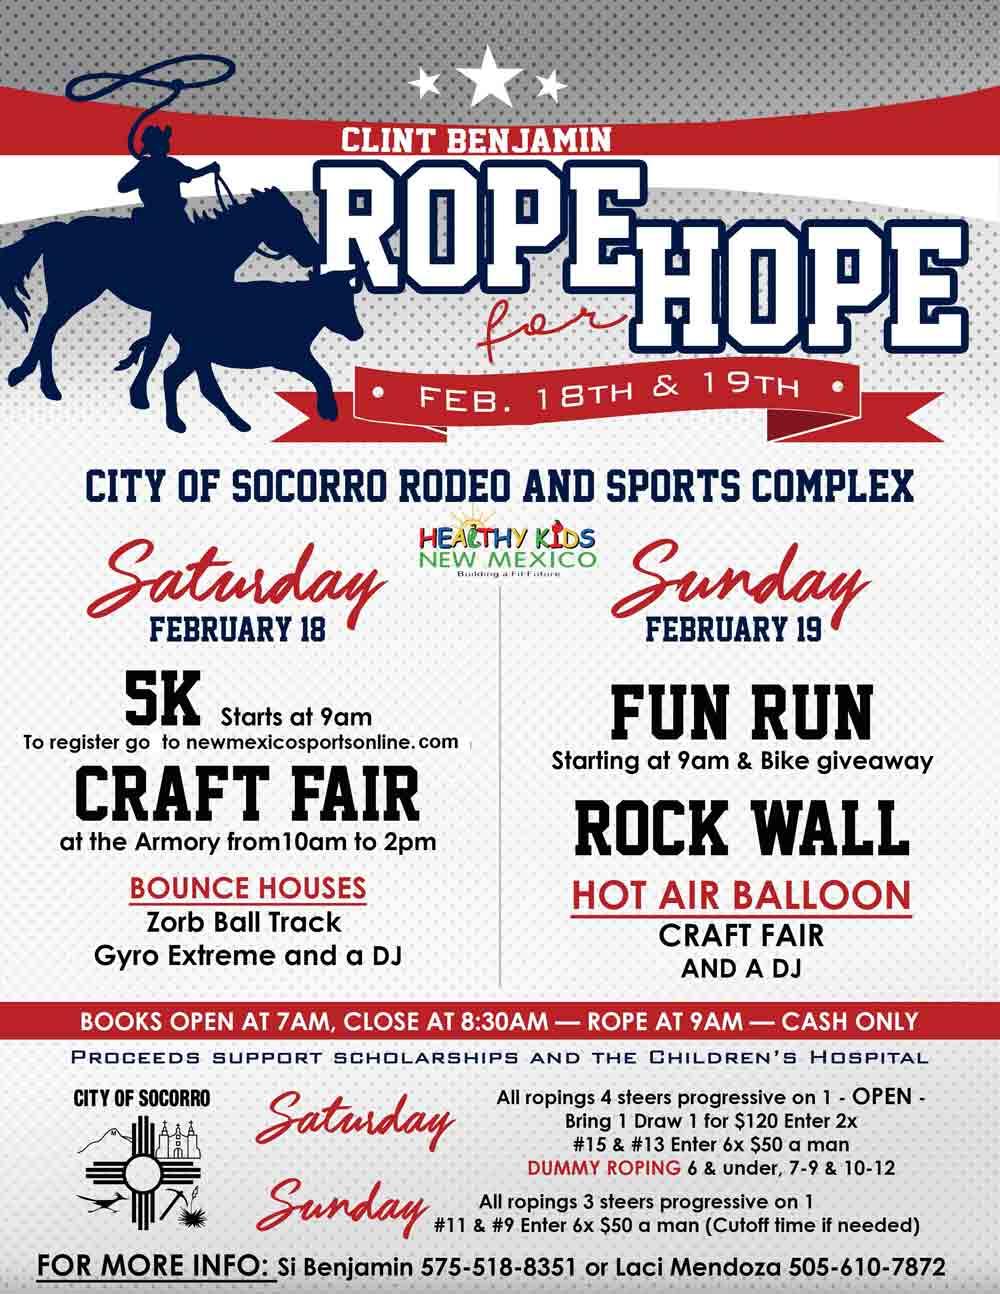 Inaugural rodeo in Socorro New Mexico